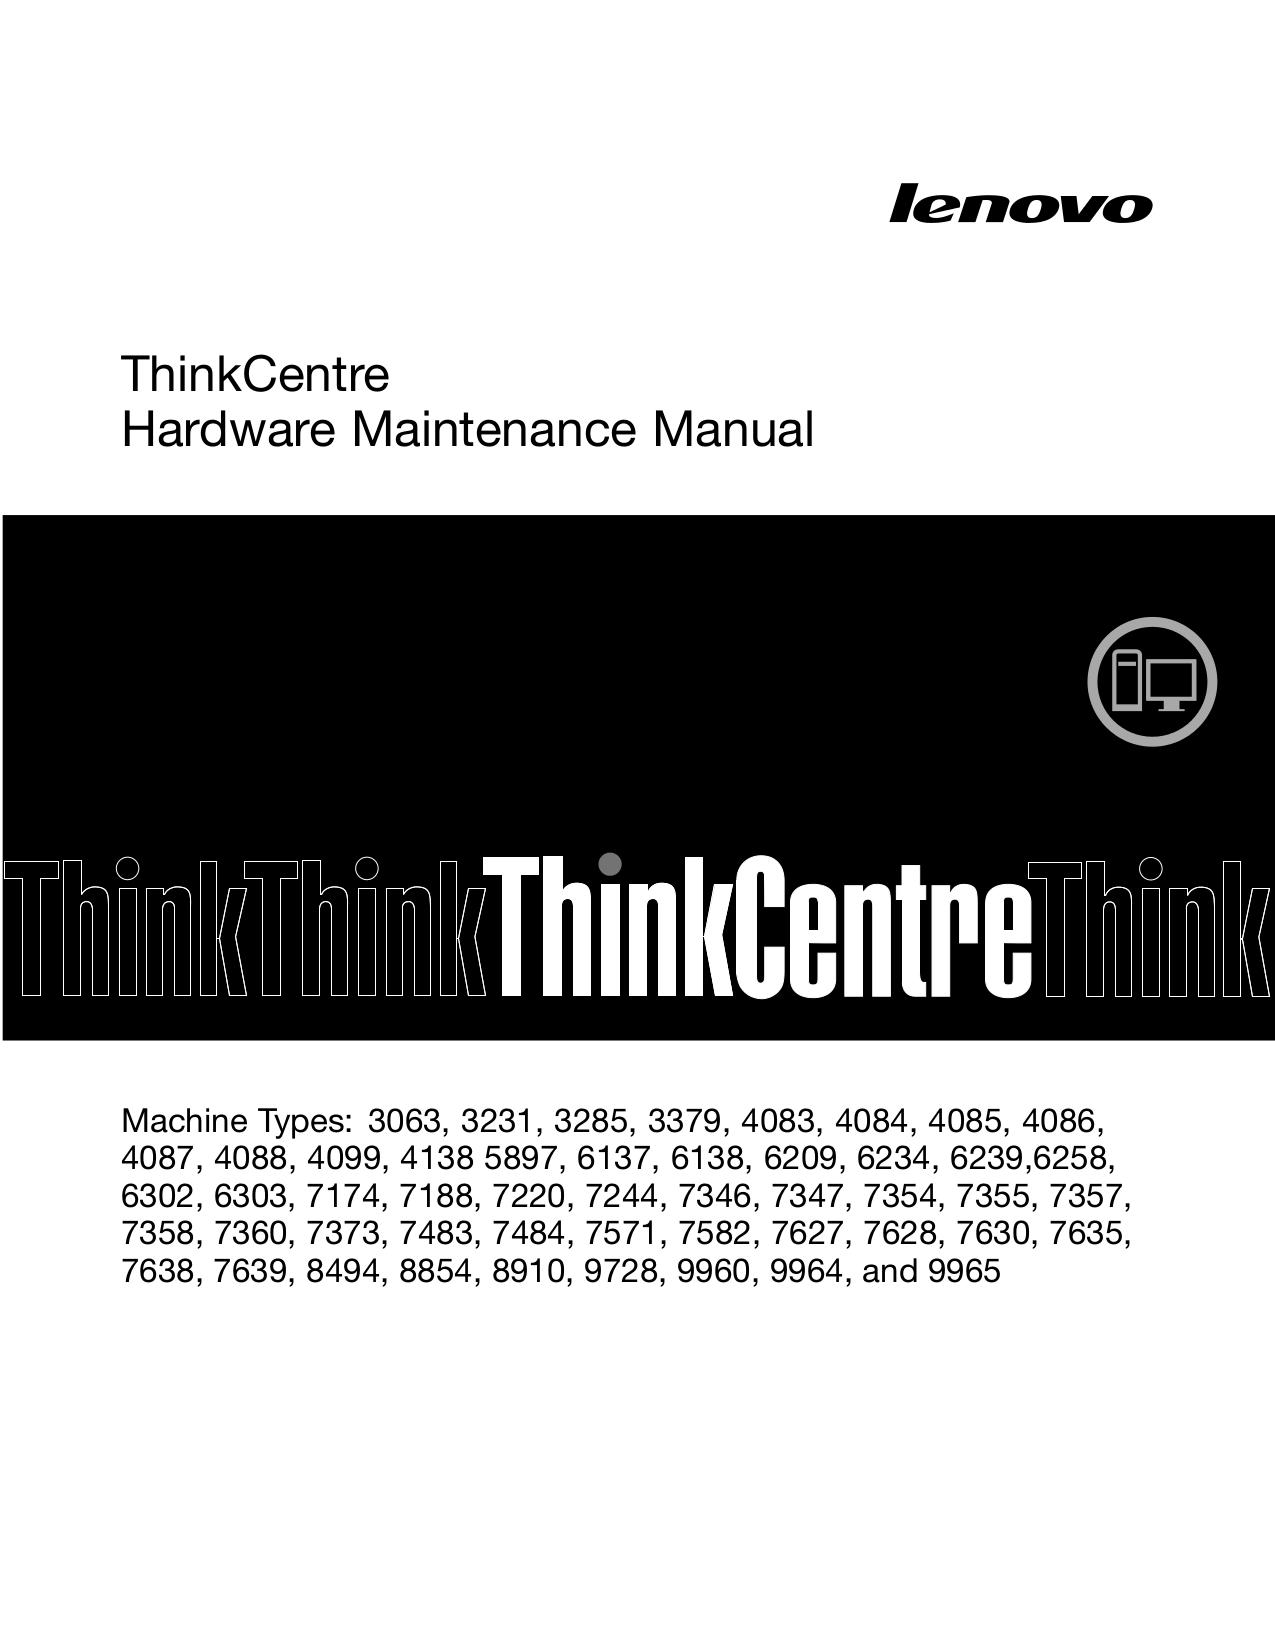 pdf for Lenovo Desktop ThinkCentre M58p 4088 manual